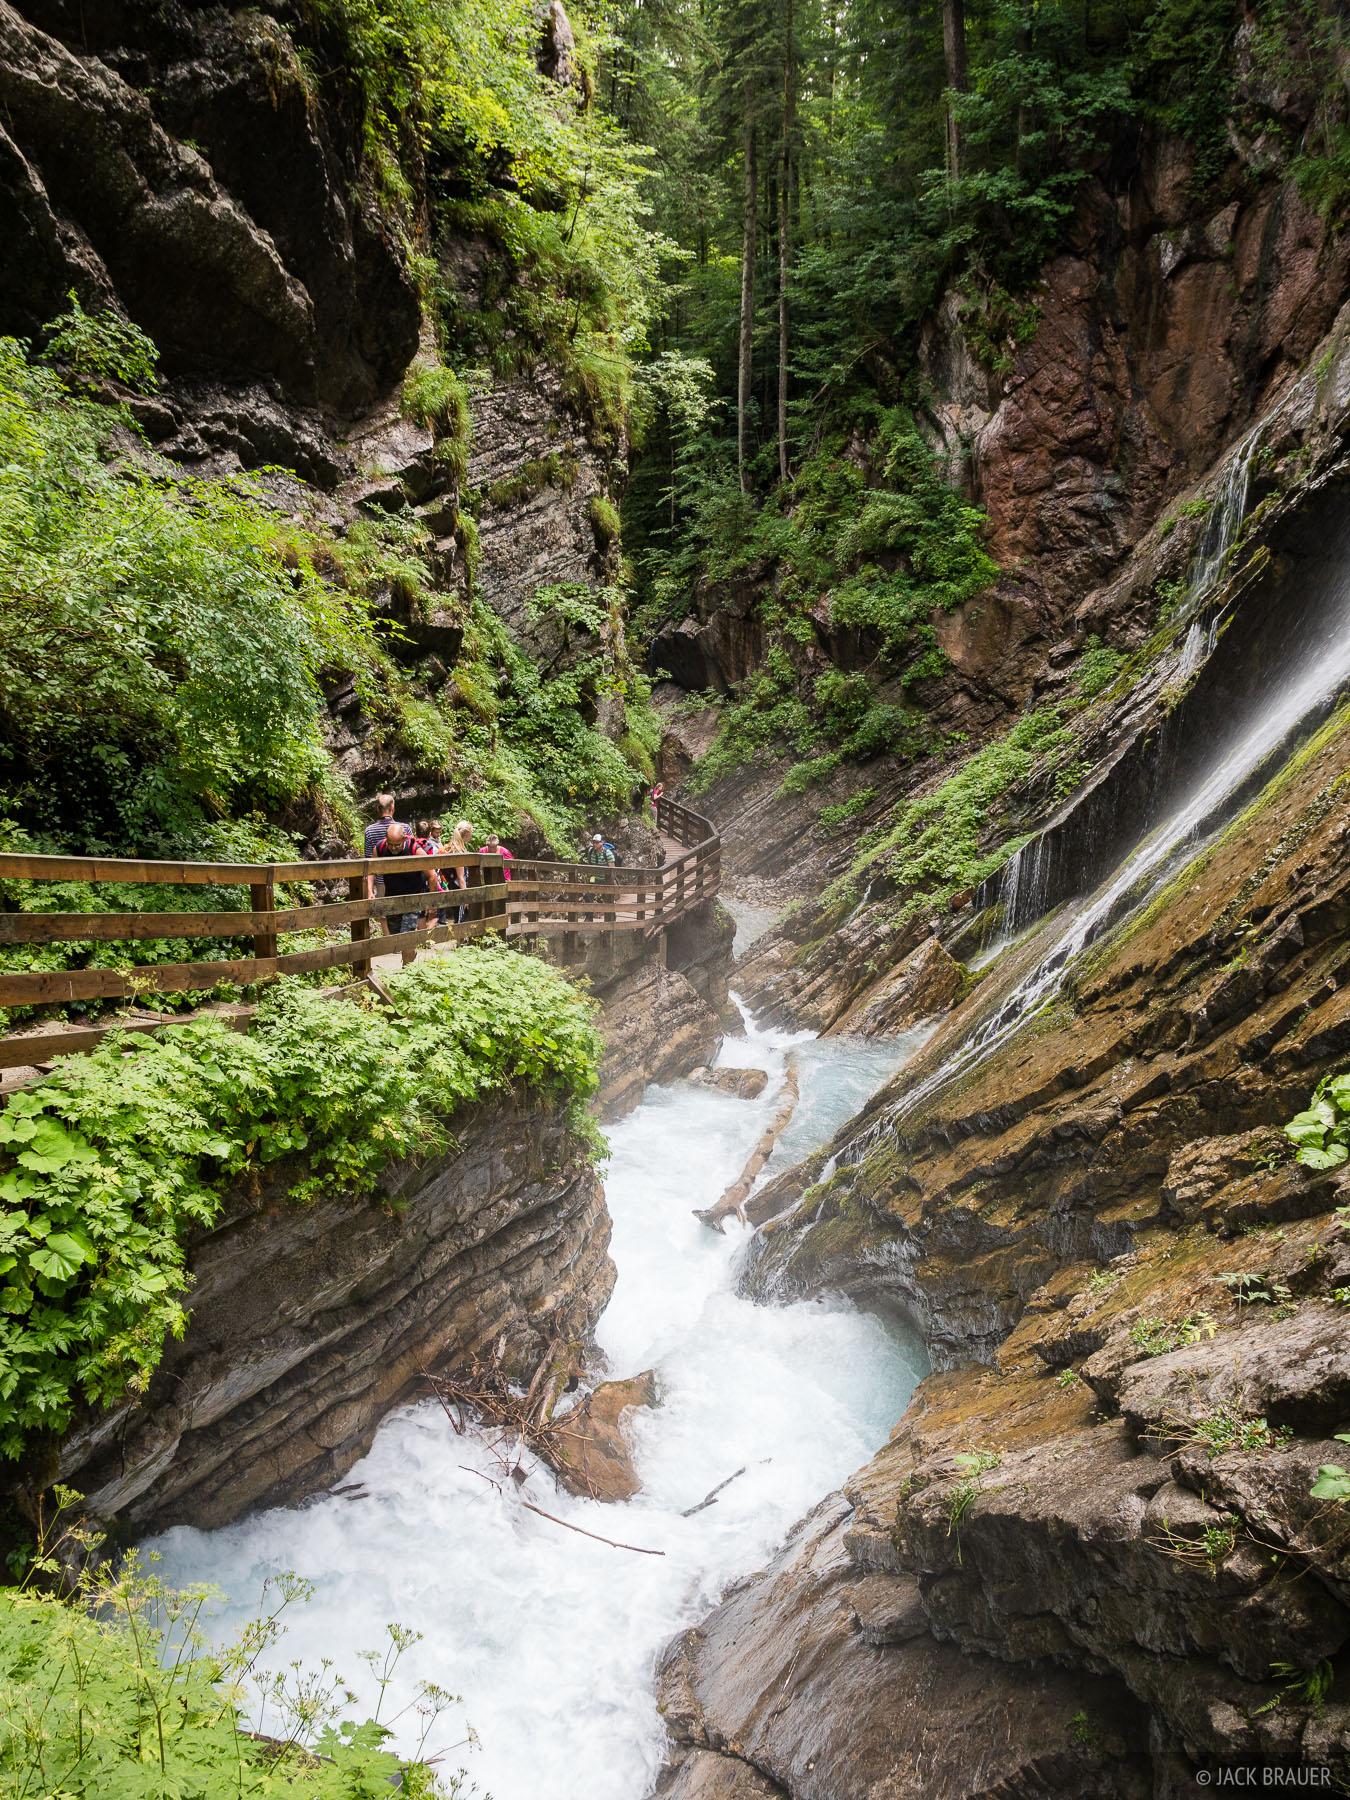 Berchtesgaden, Europe, Germany, Wimbachklamm, photo